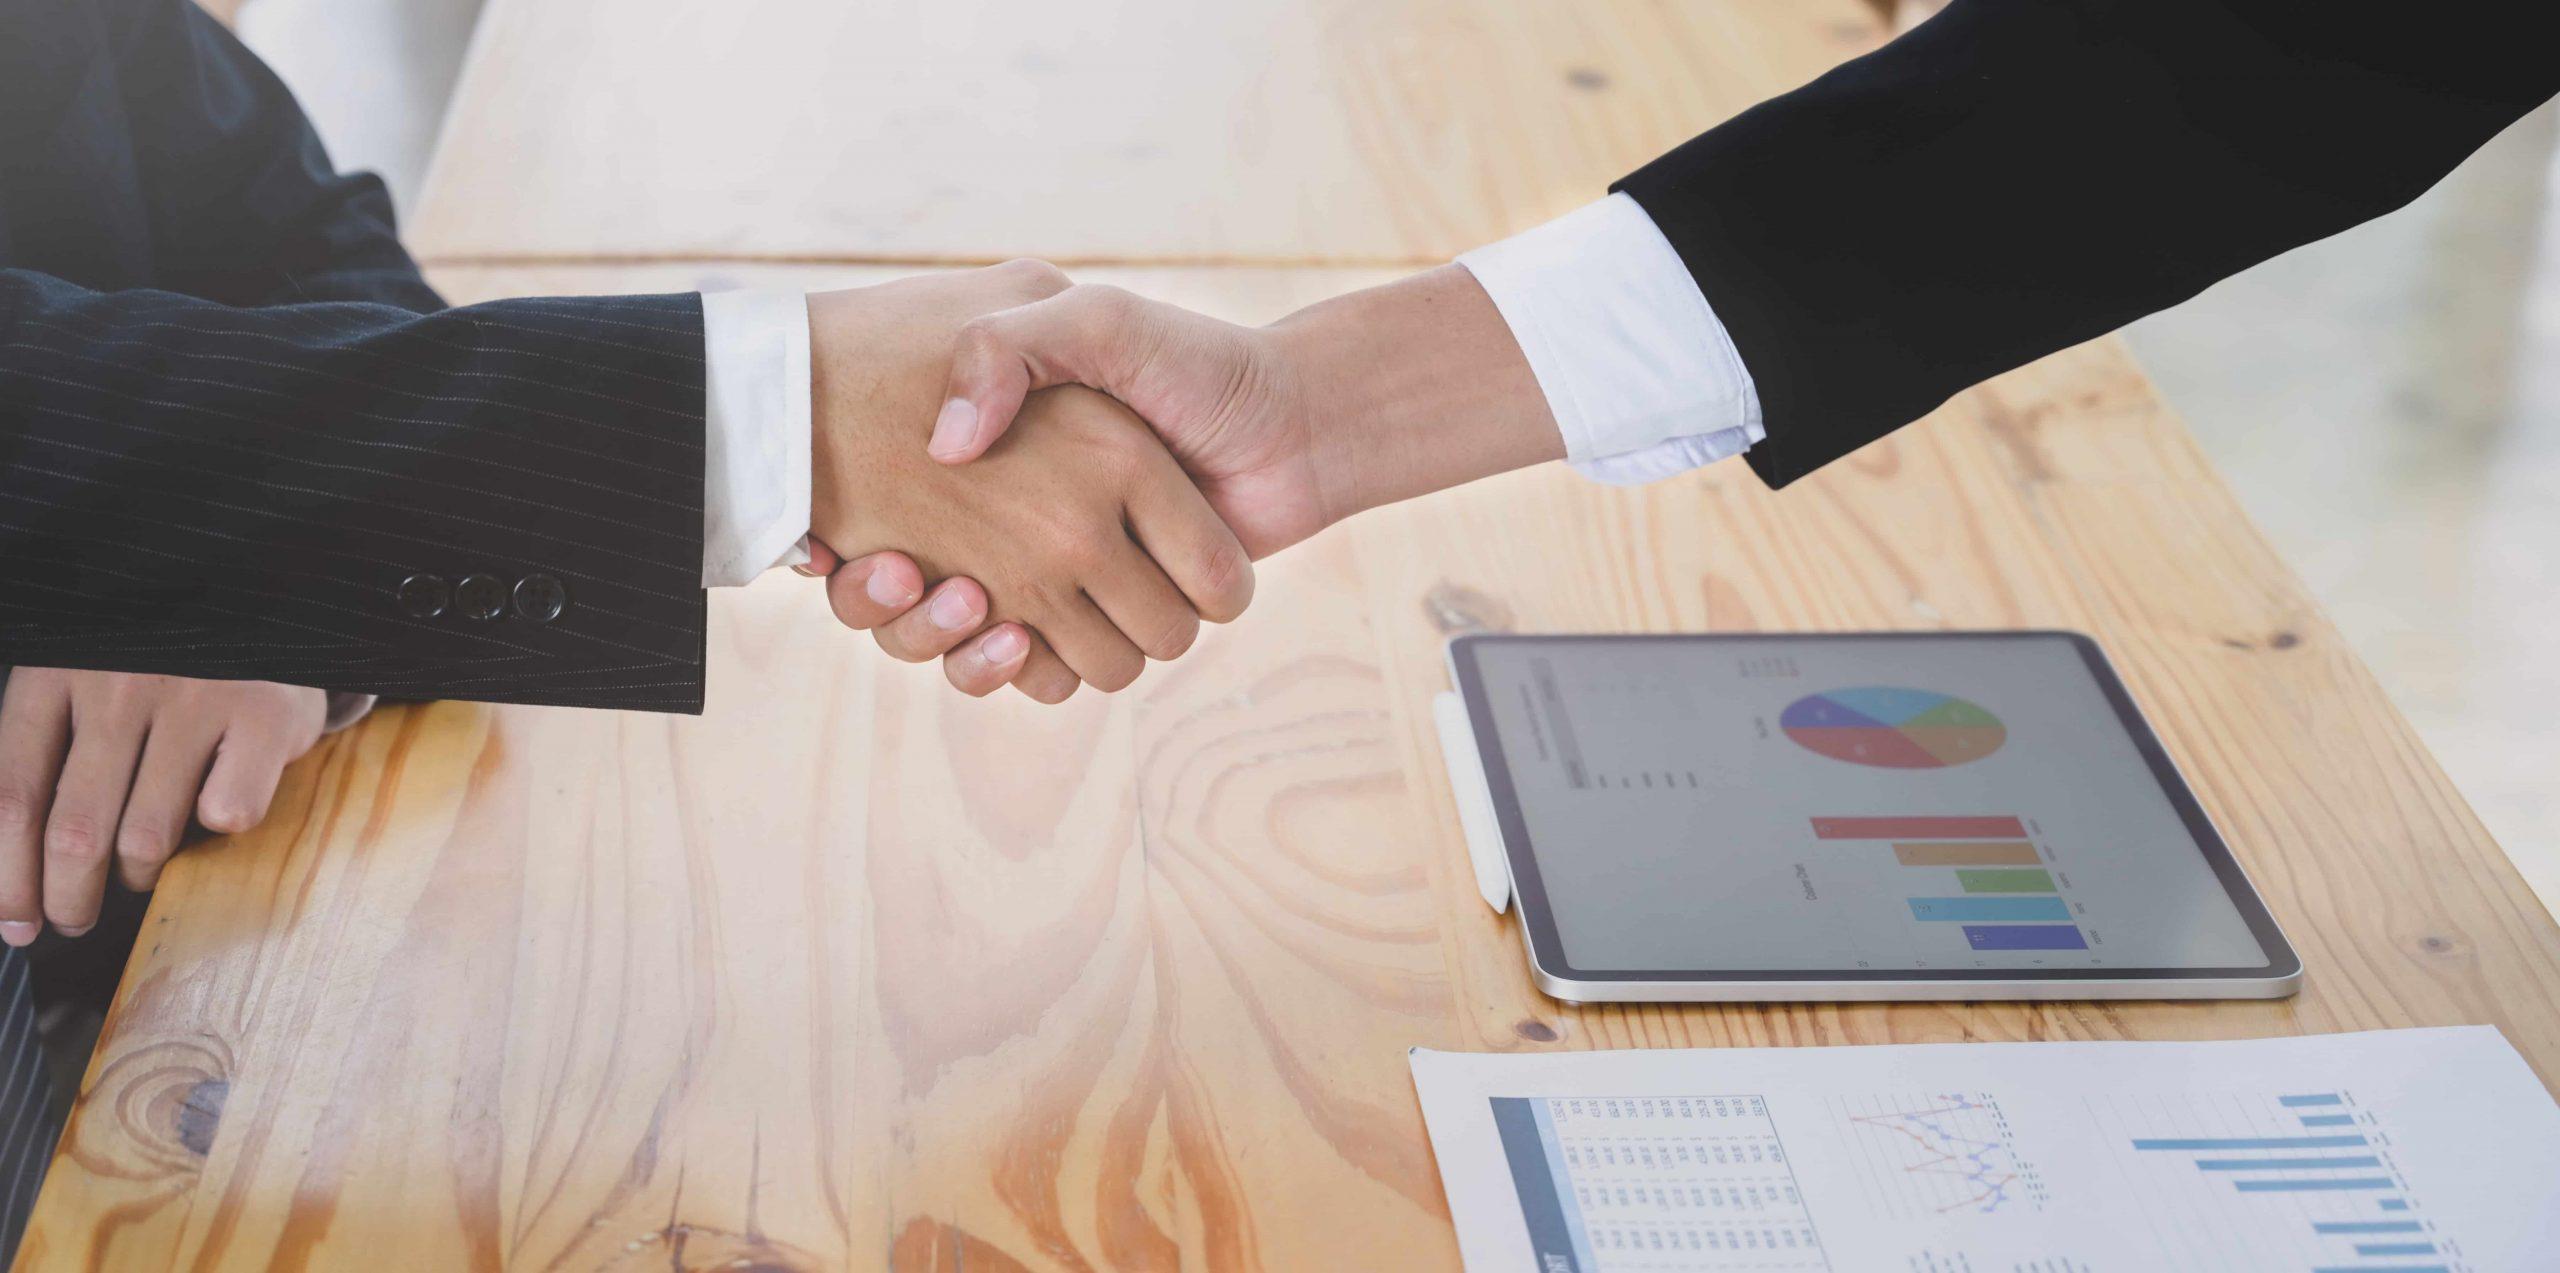 Business Partners Hand Shake